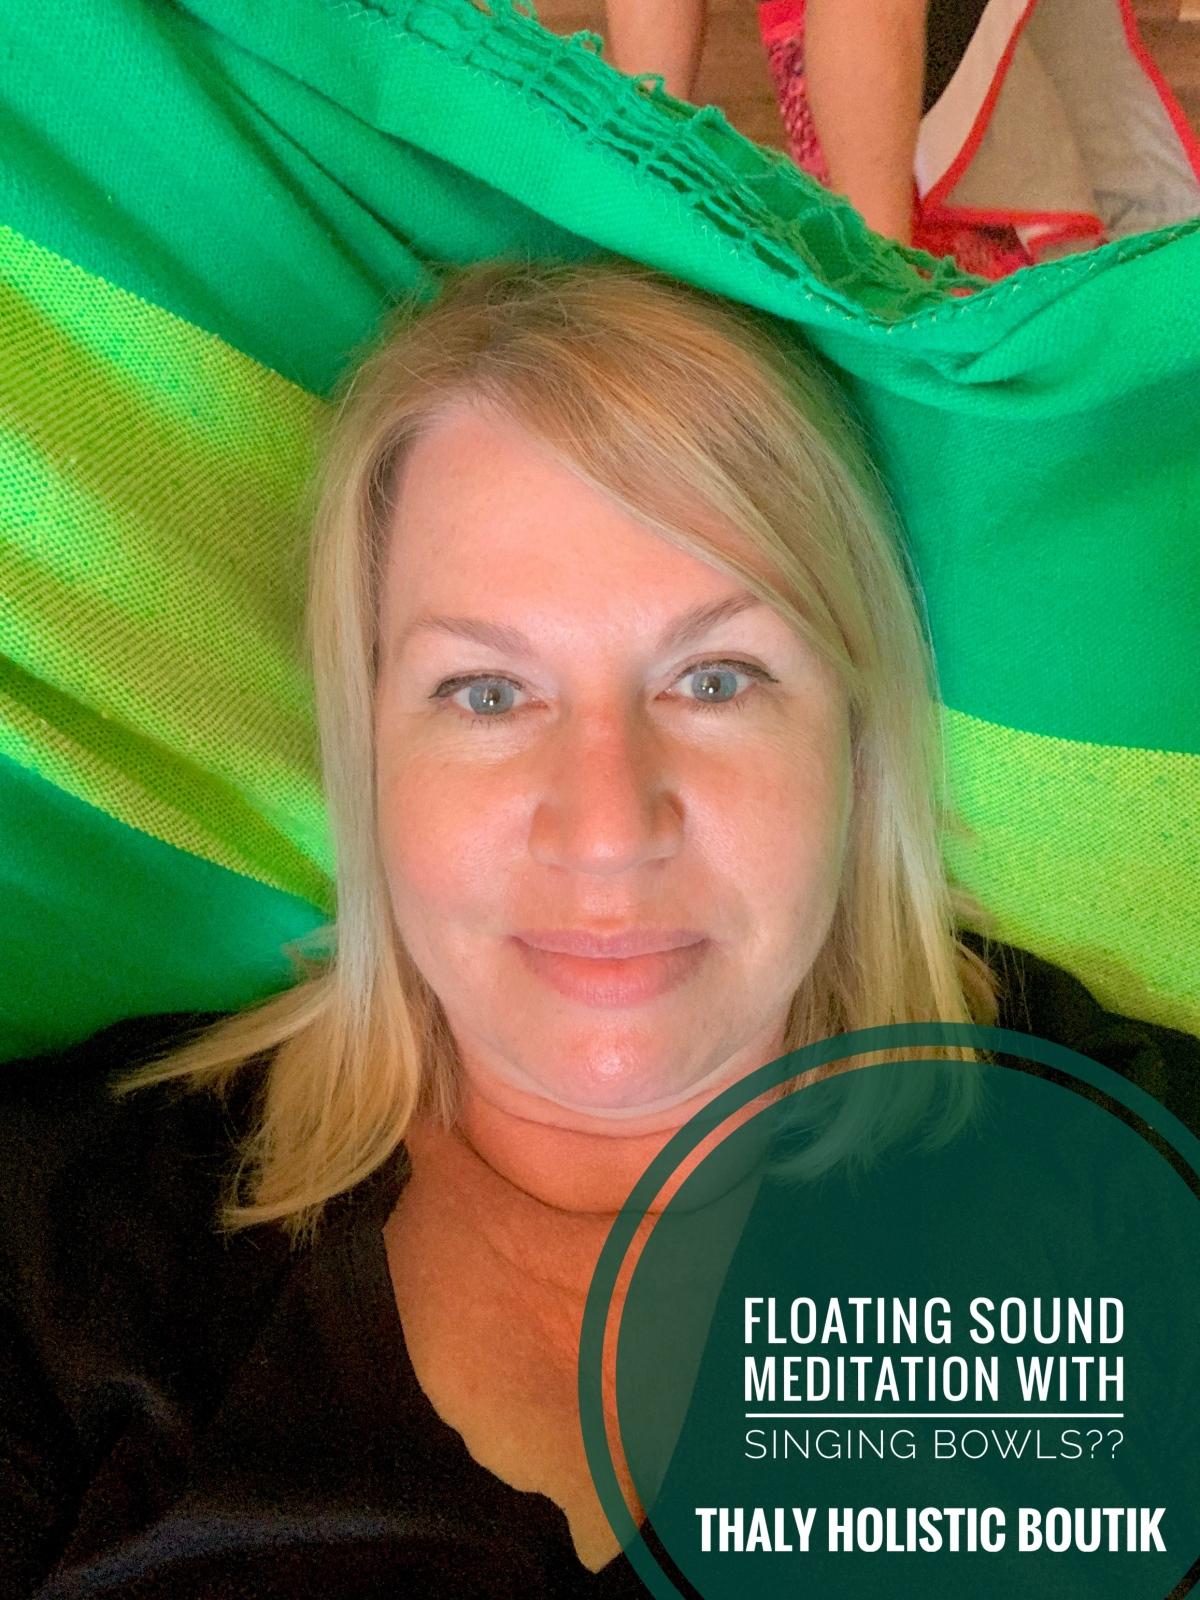 Floating Sound Meditation with Singing Bowls…saywhat??